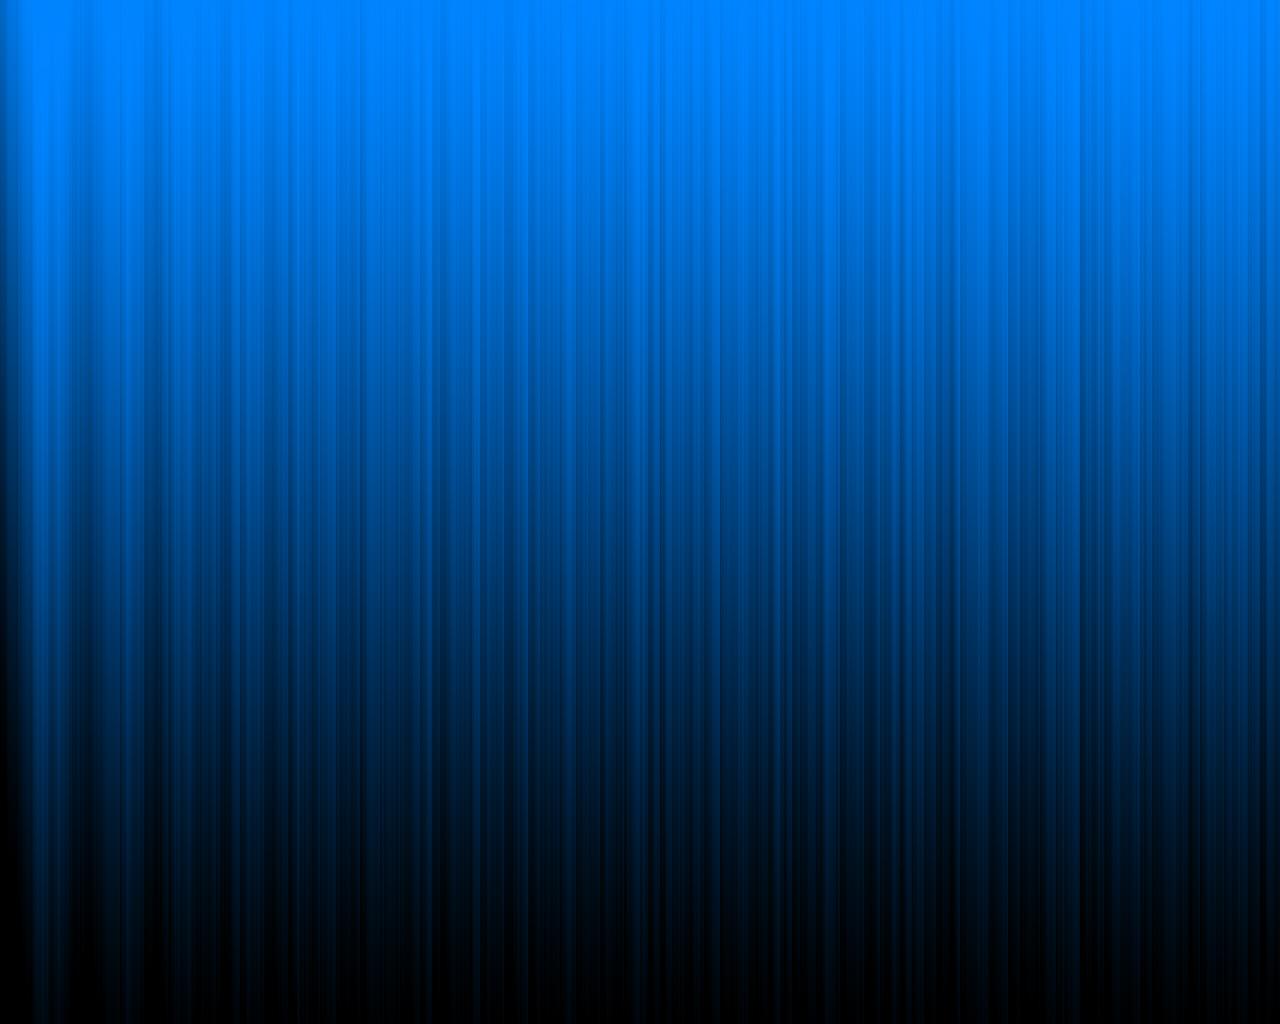 Desktop Wallpaper Desktop Hd Wallpapers 1280x1024